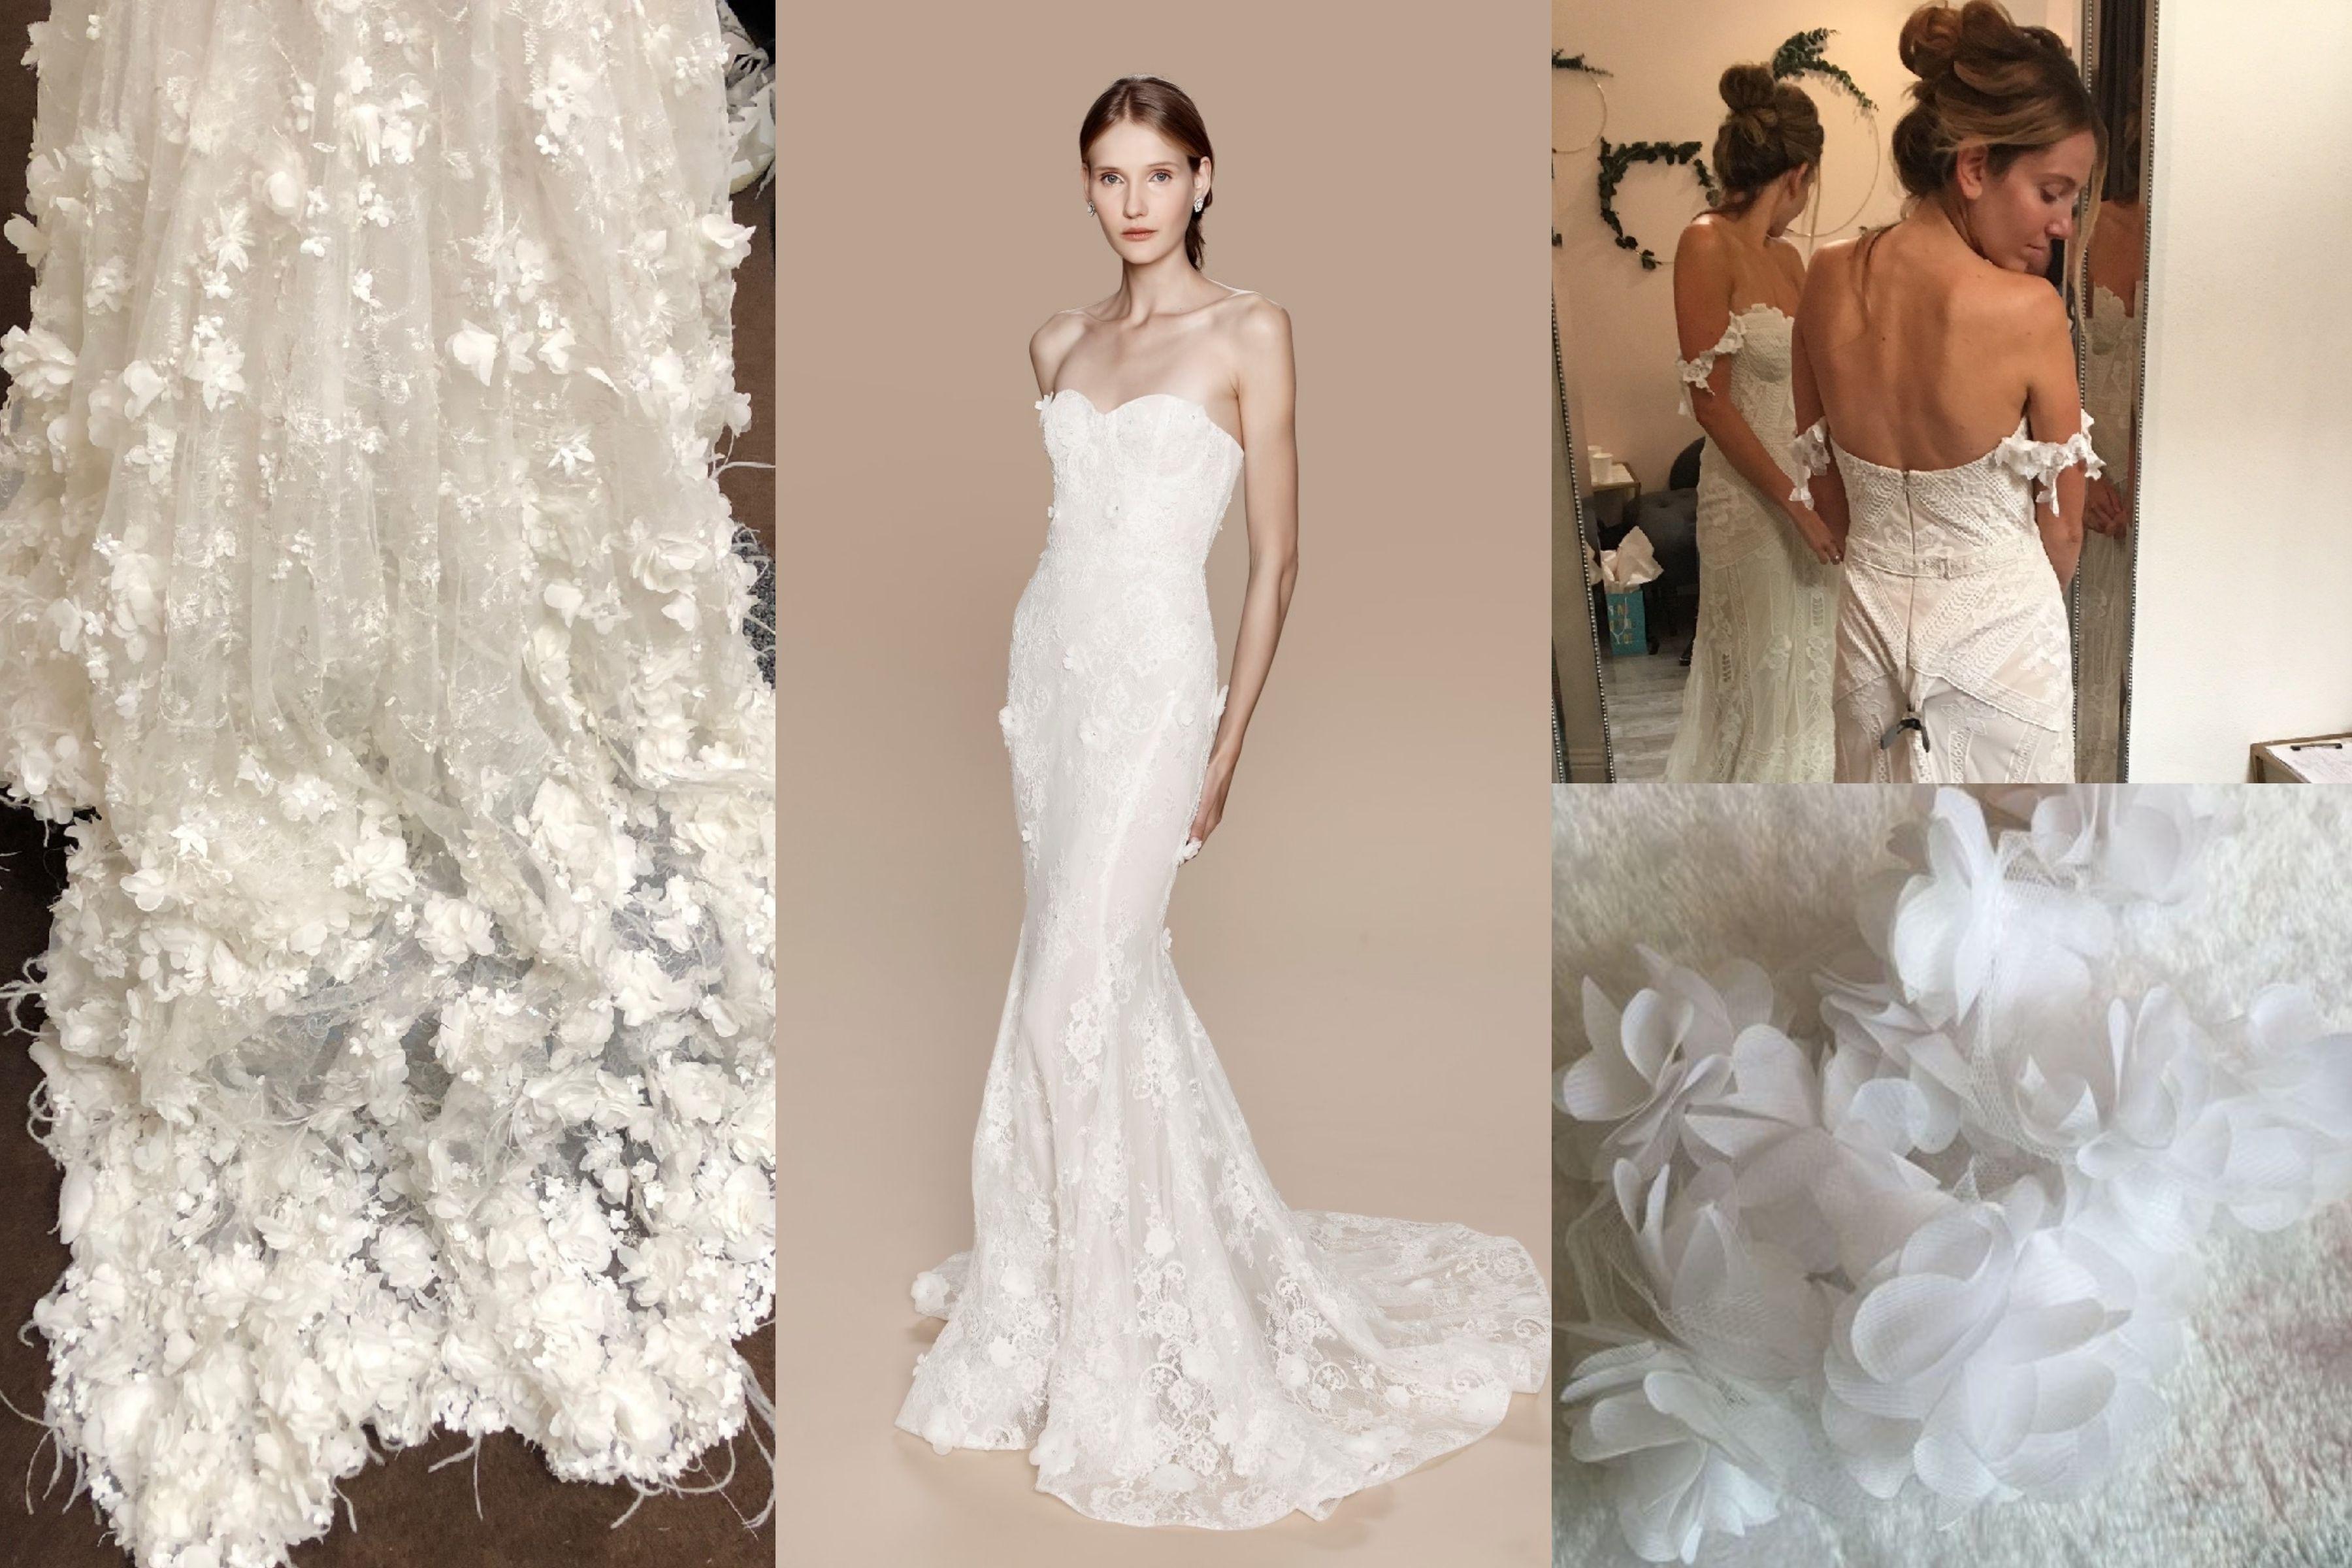 Anomalie custom wedding dress inspiration photos   Custom wedding ...